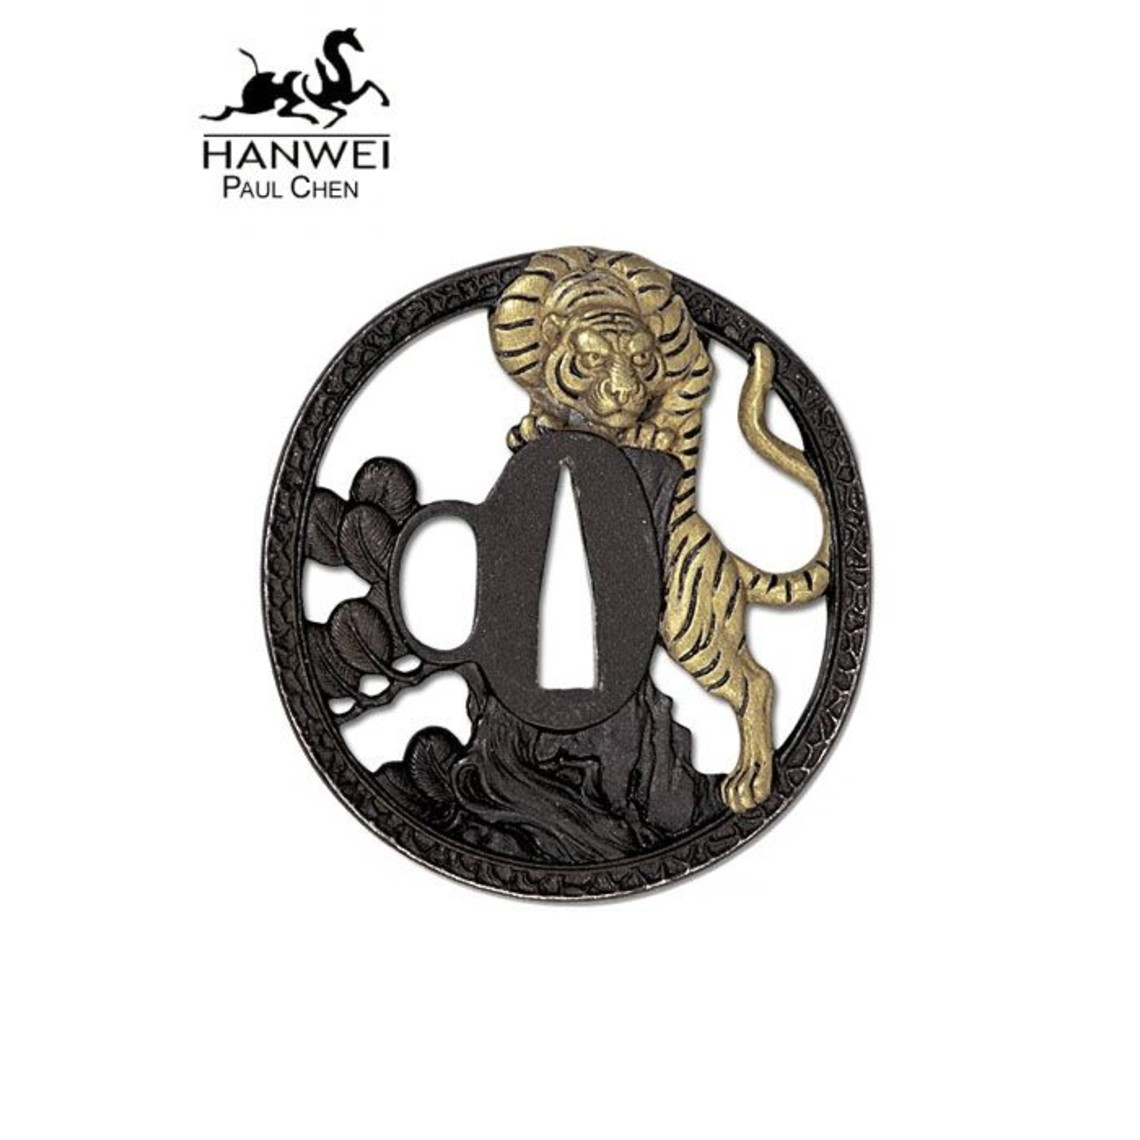 Hanwei Tiger Elite katana